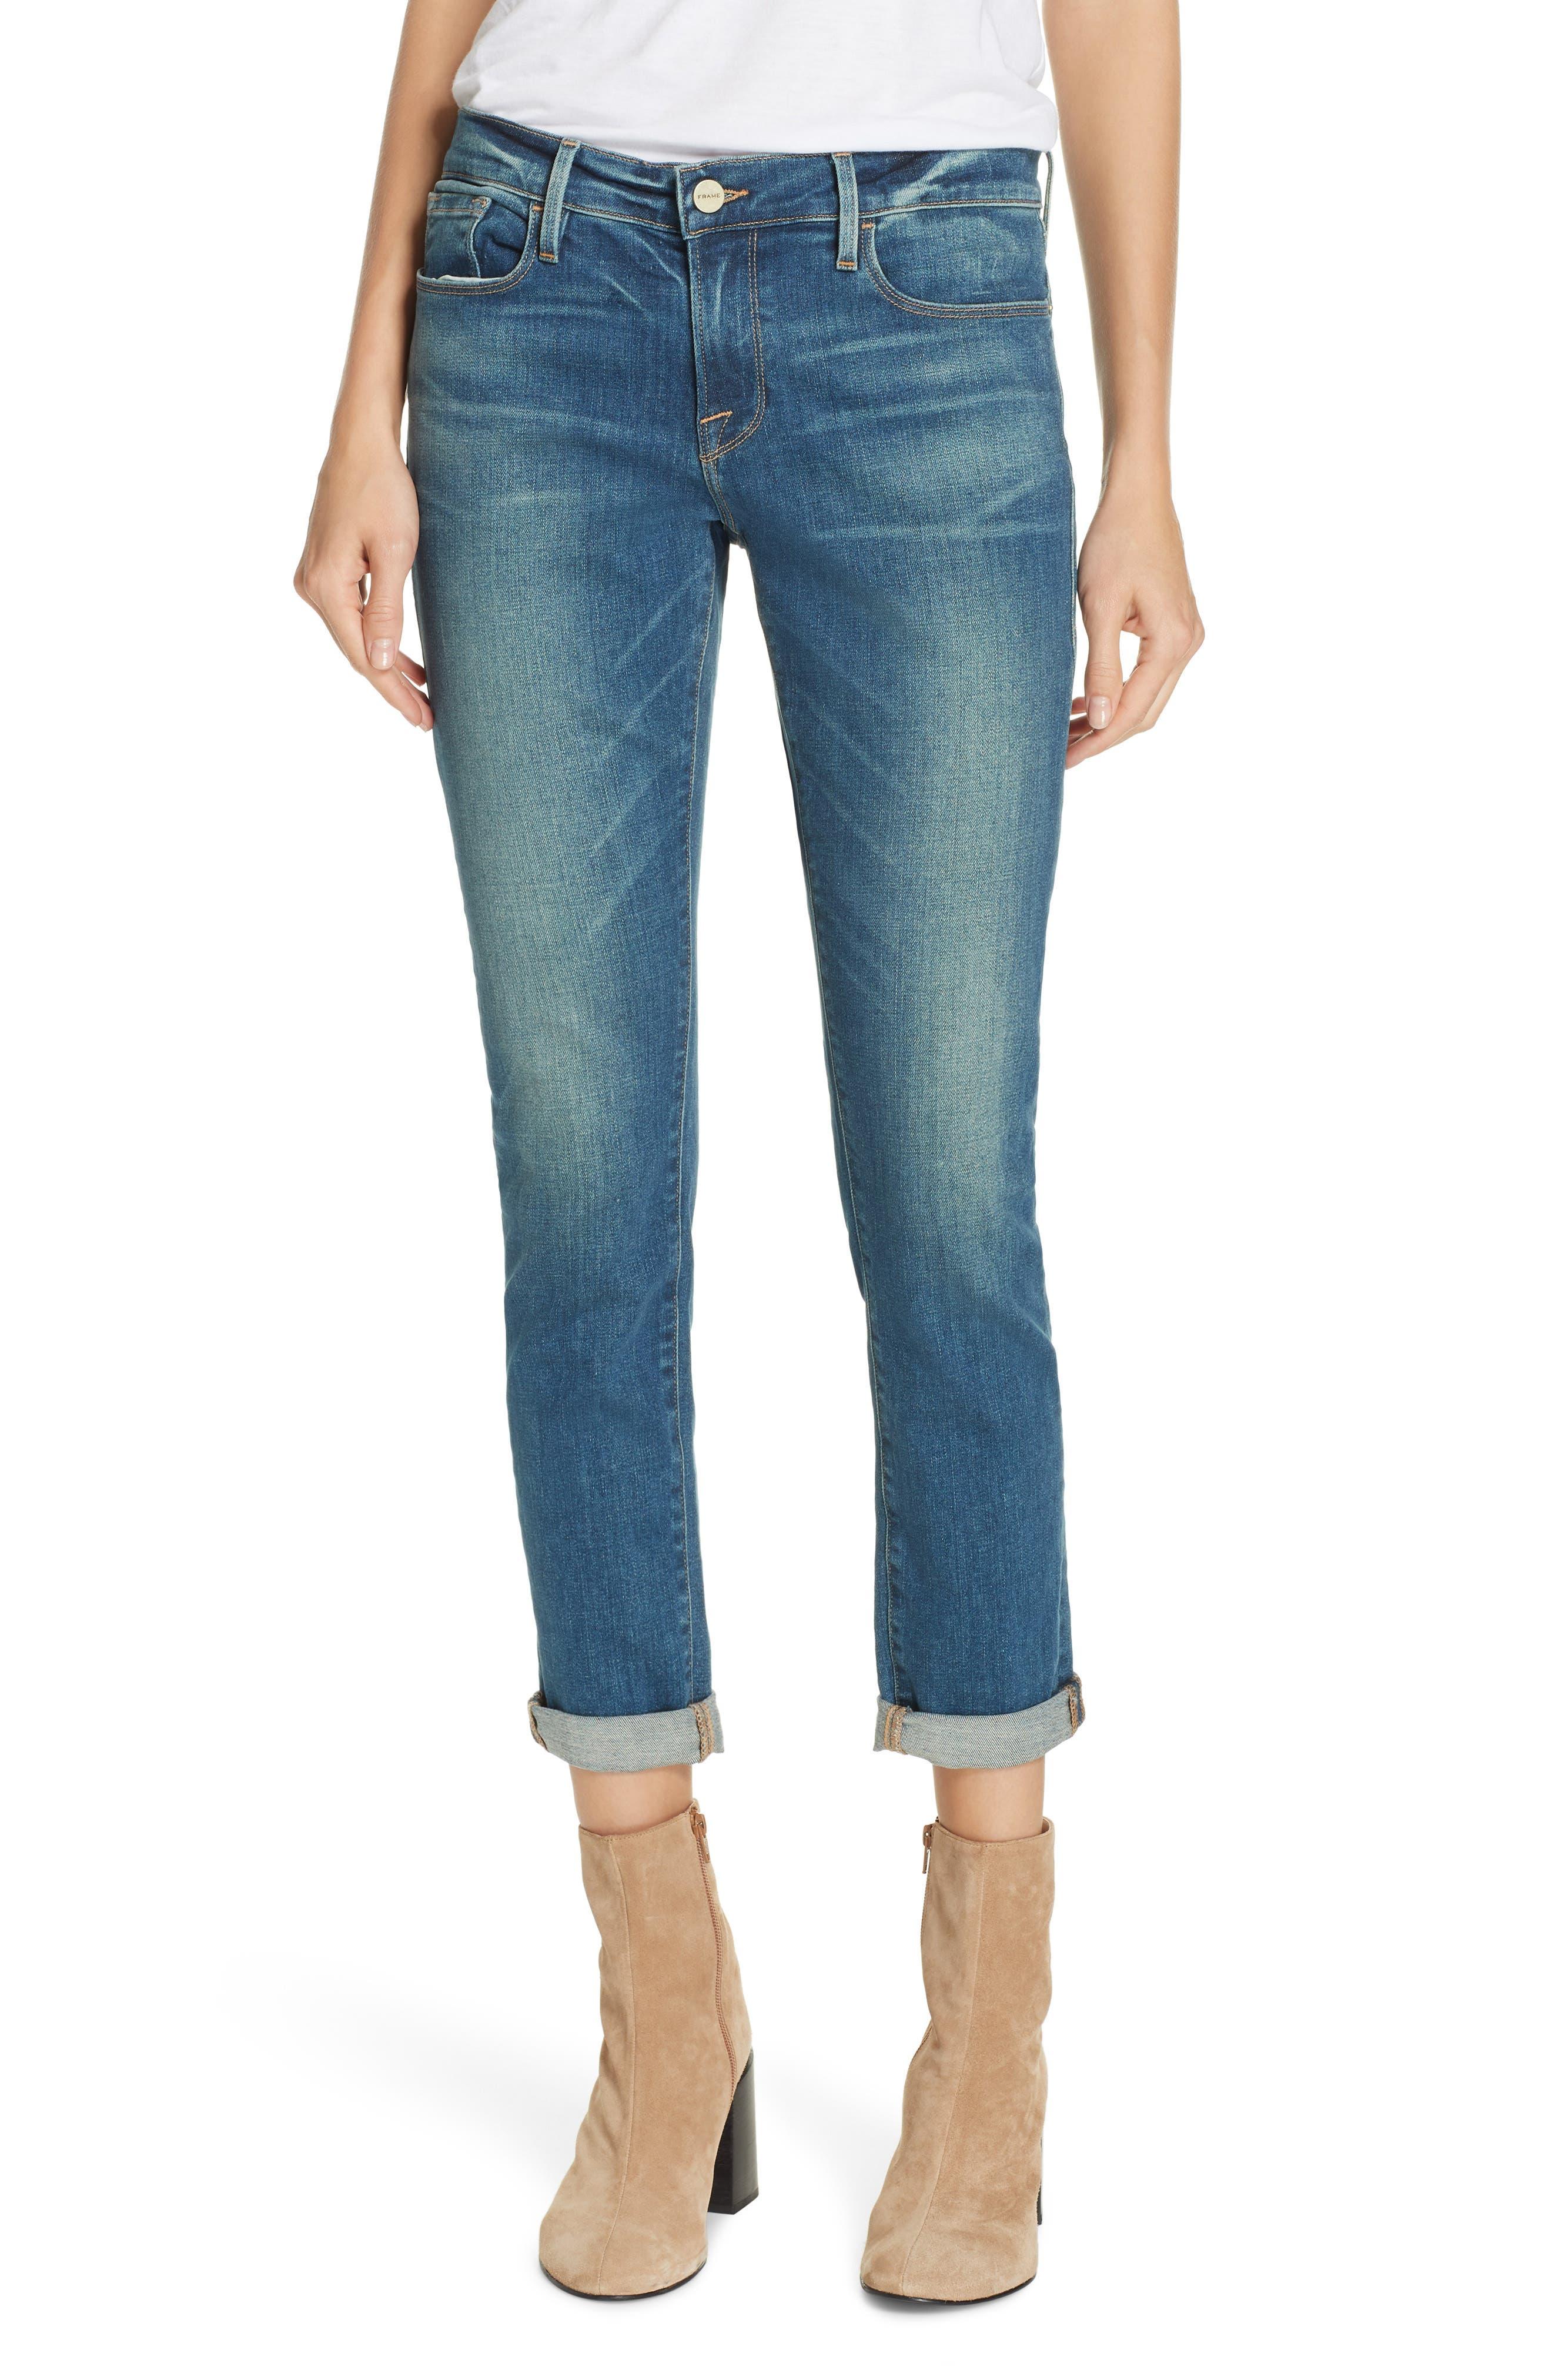 Le Garcon Slim Boyfriend Jeans,                         Main,                         color, BERKLEY SQUARE